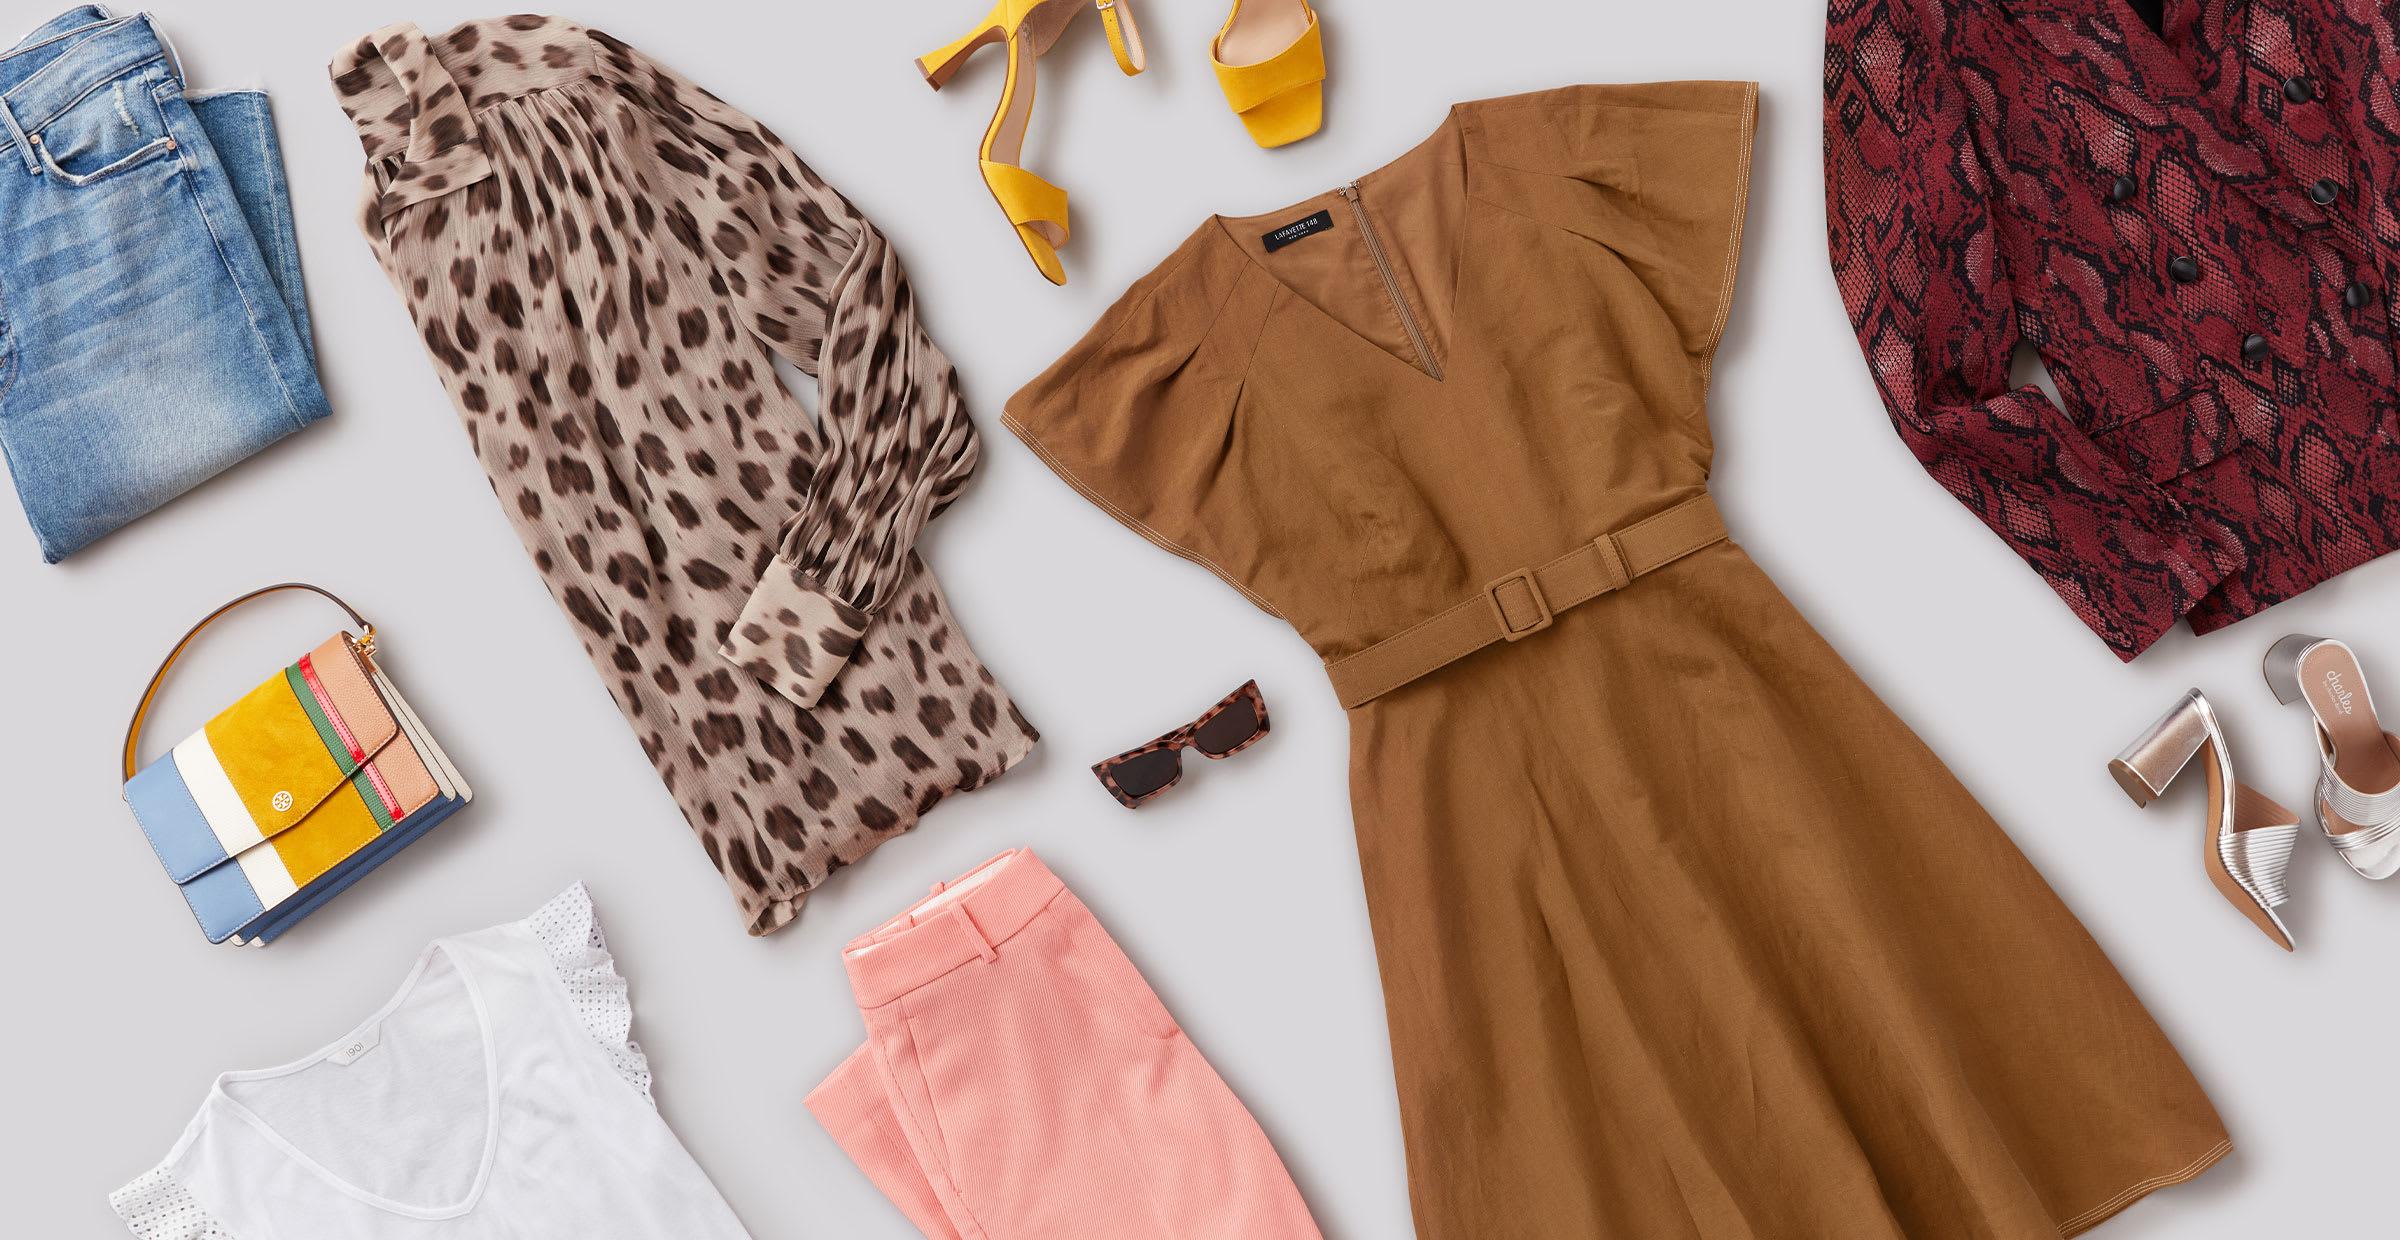 colorful wardrobe for winter